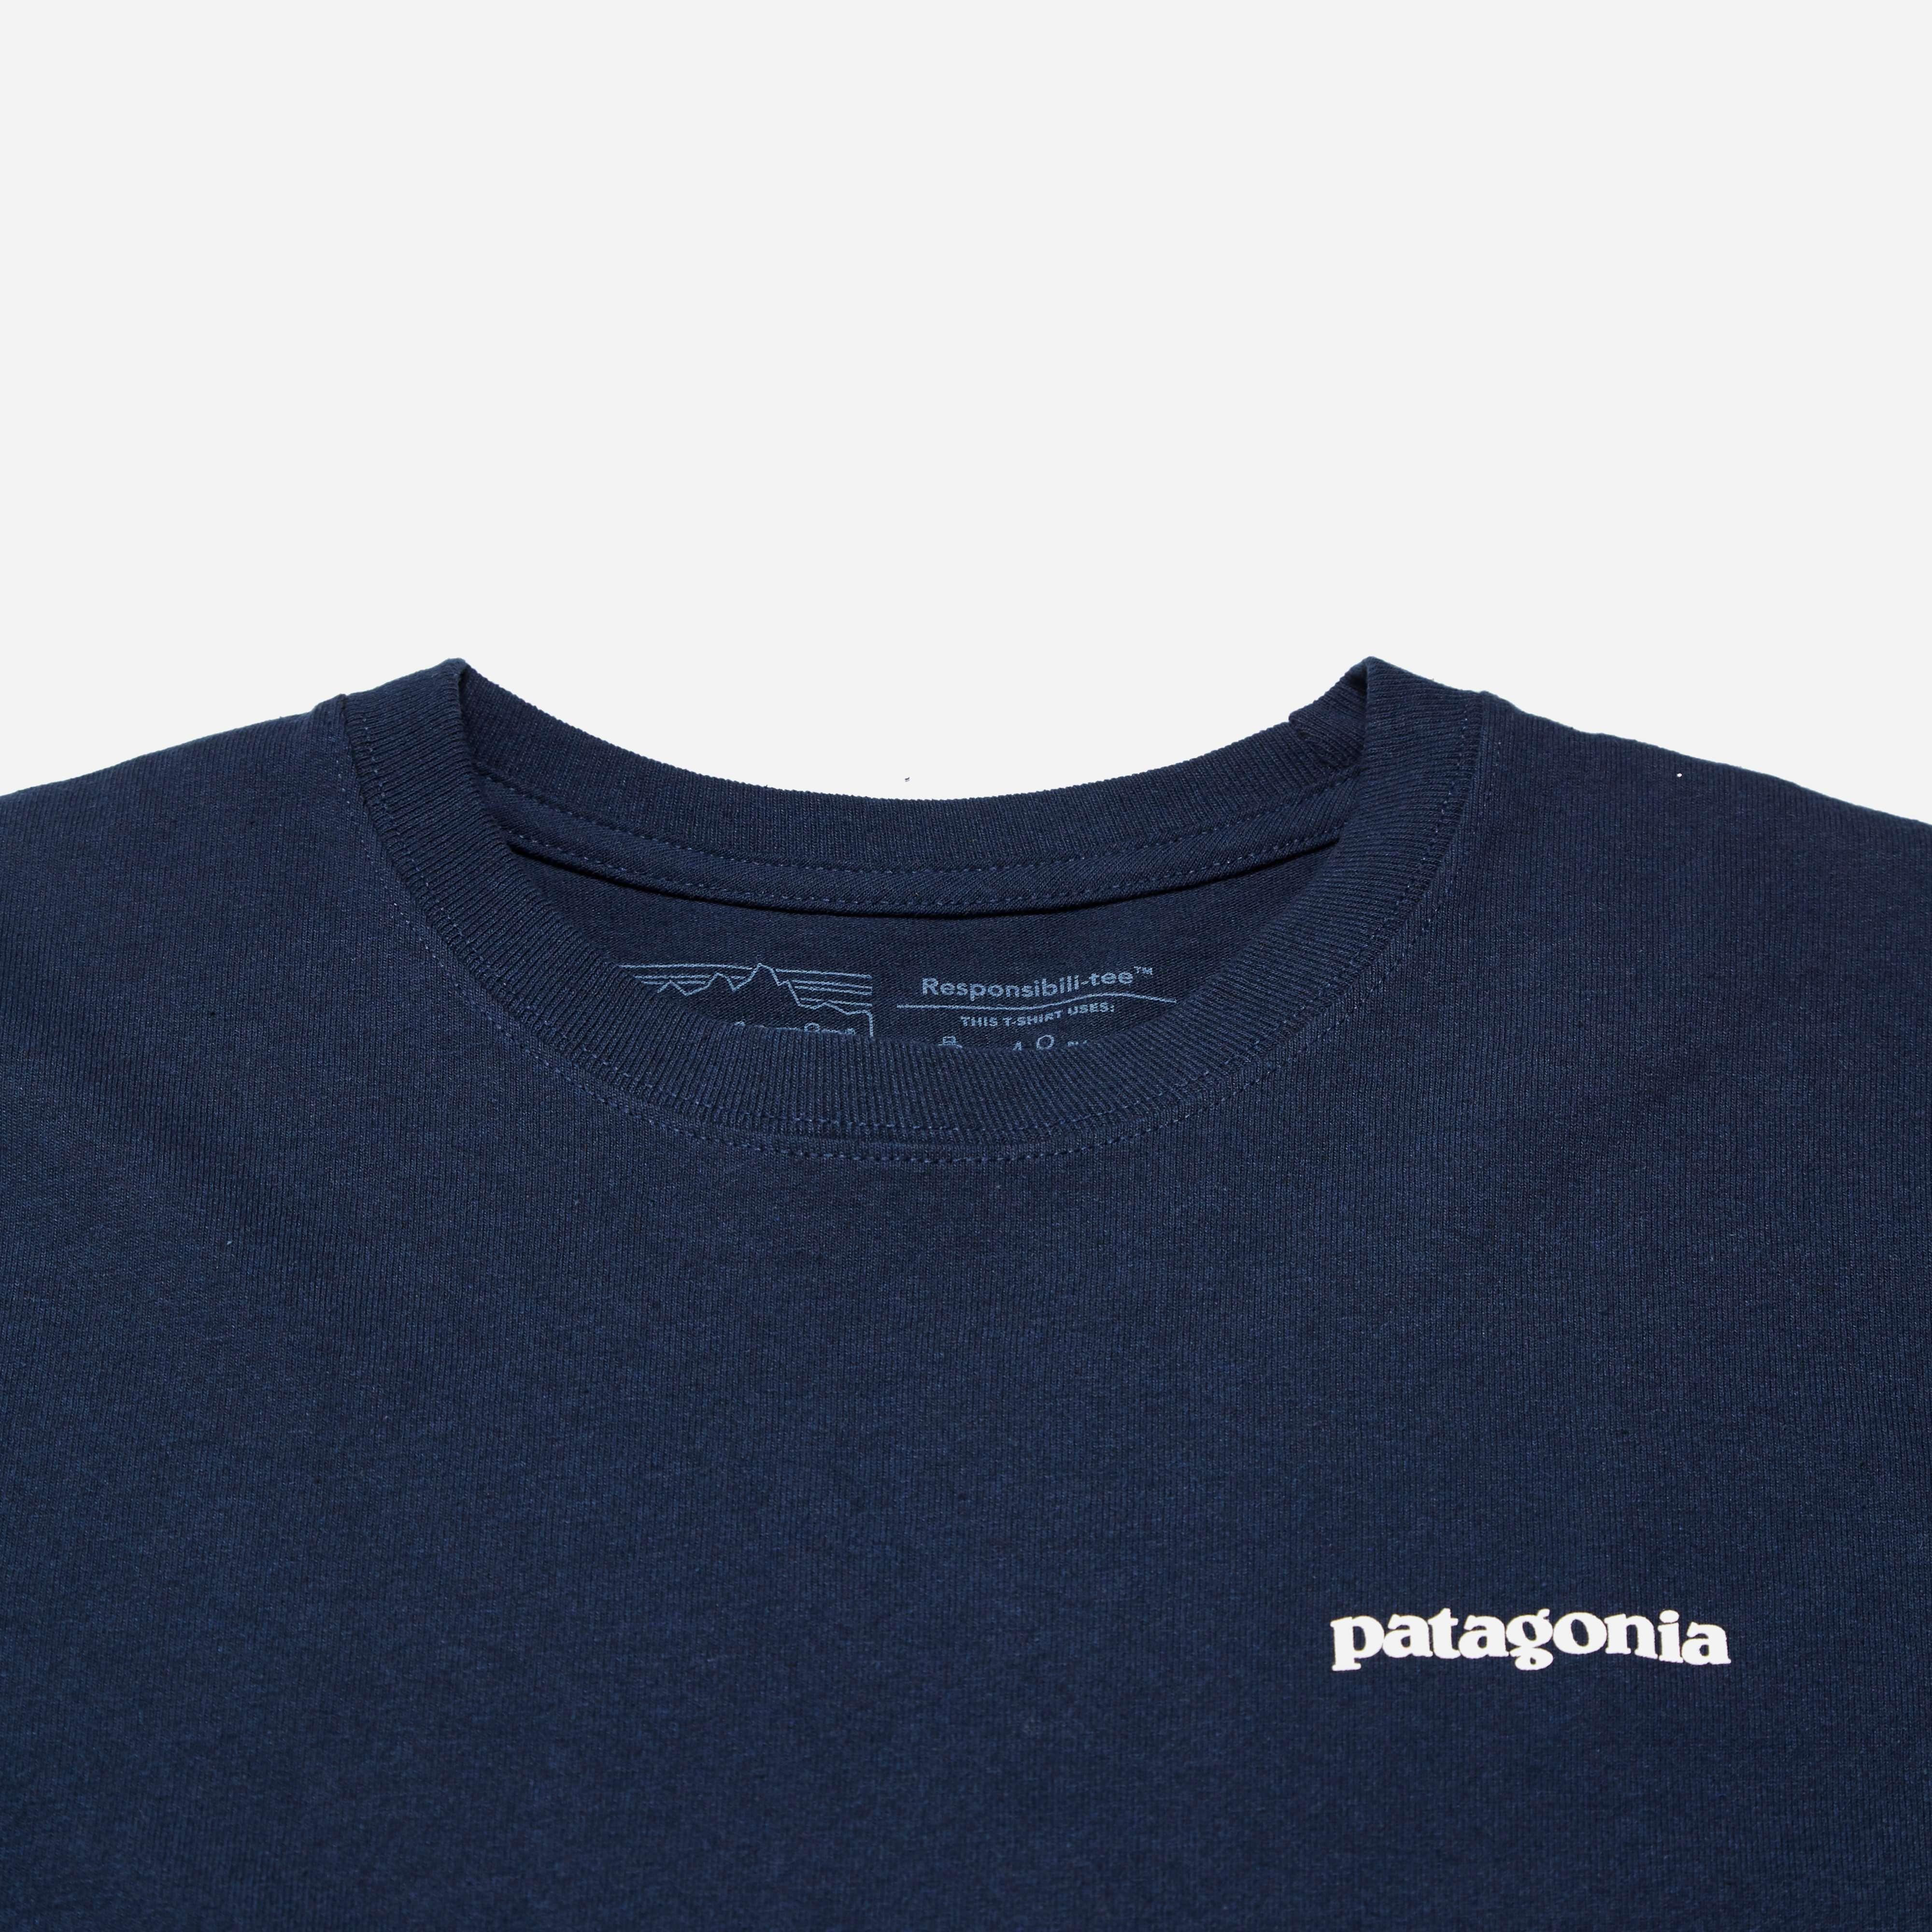 Patagonia P-6 Responsibili T-Shirt